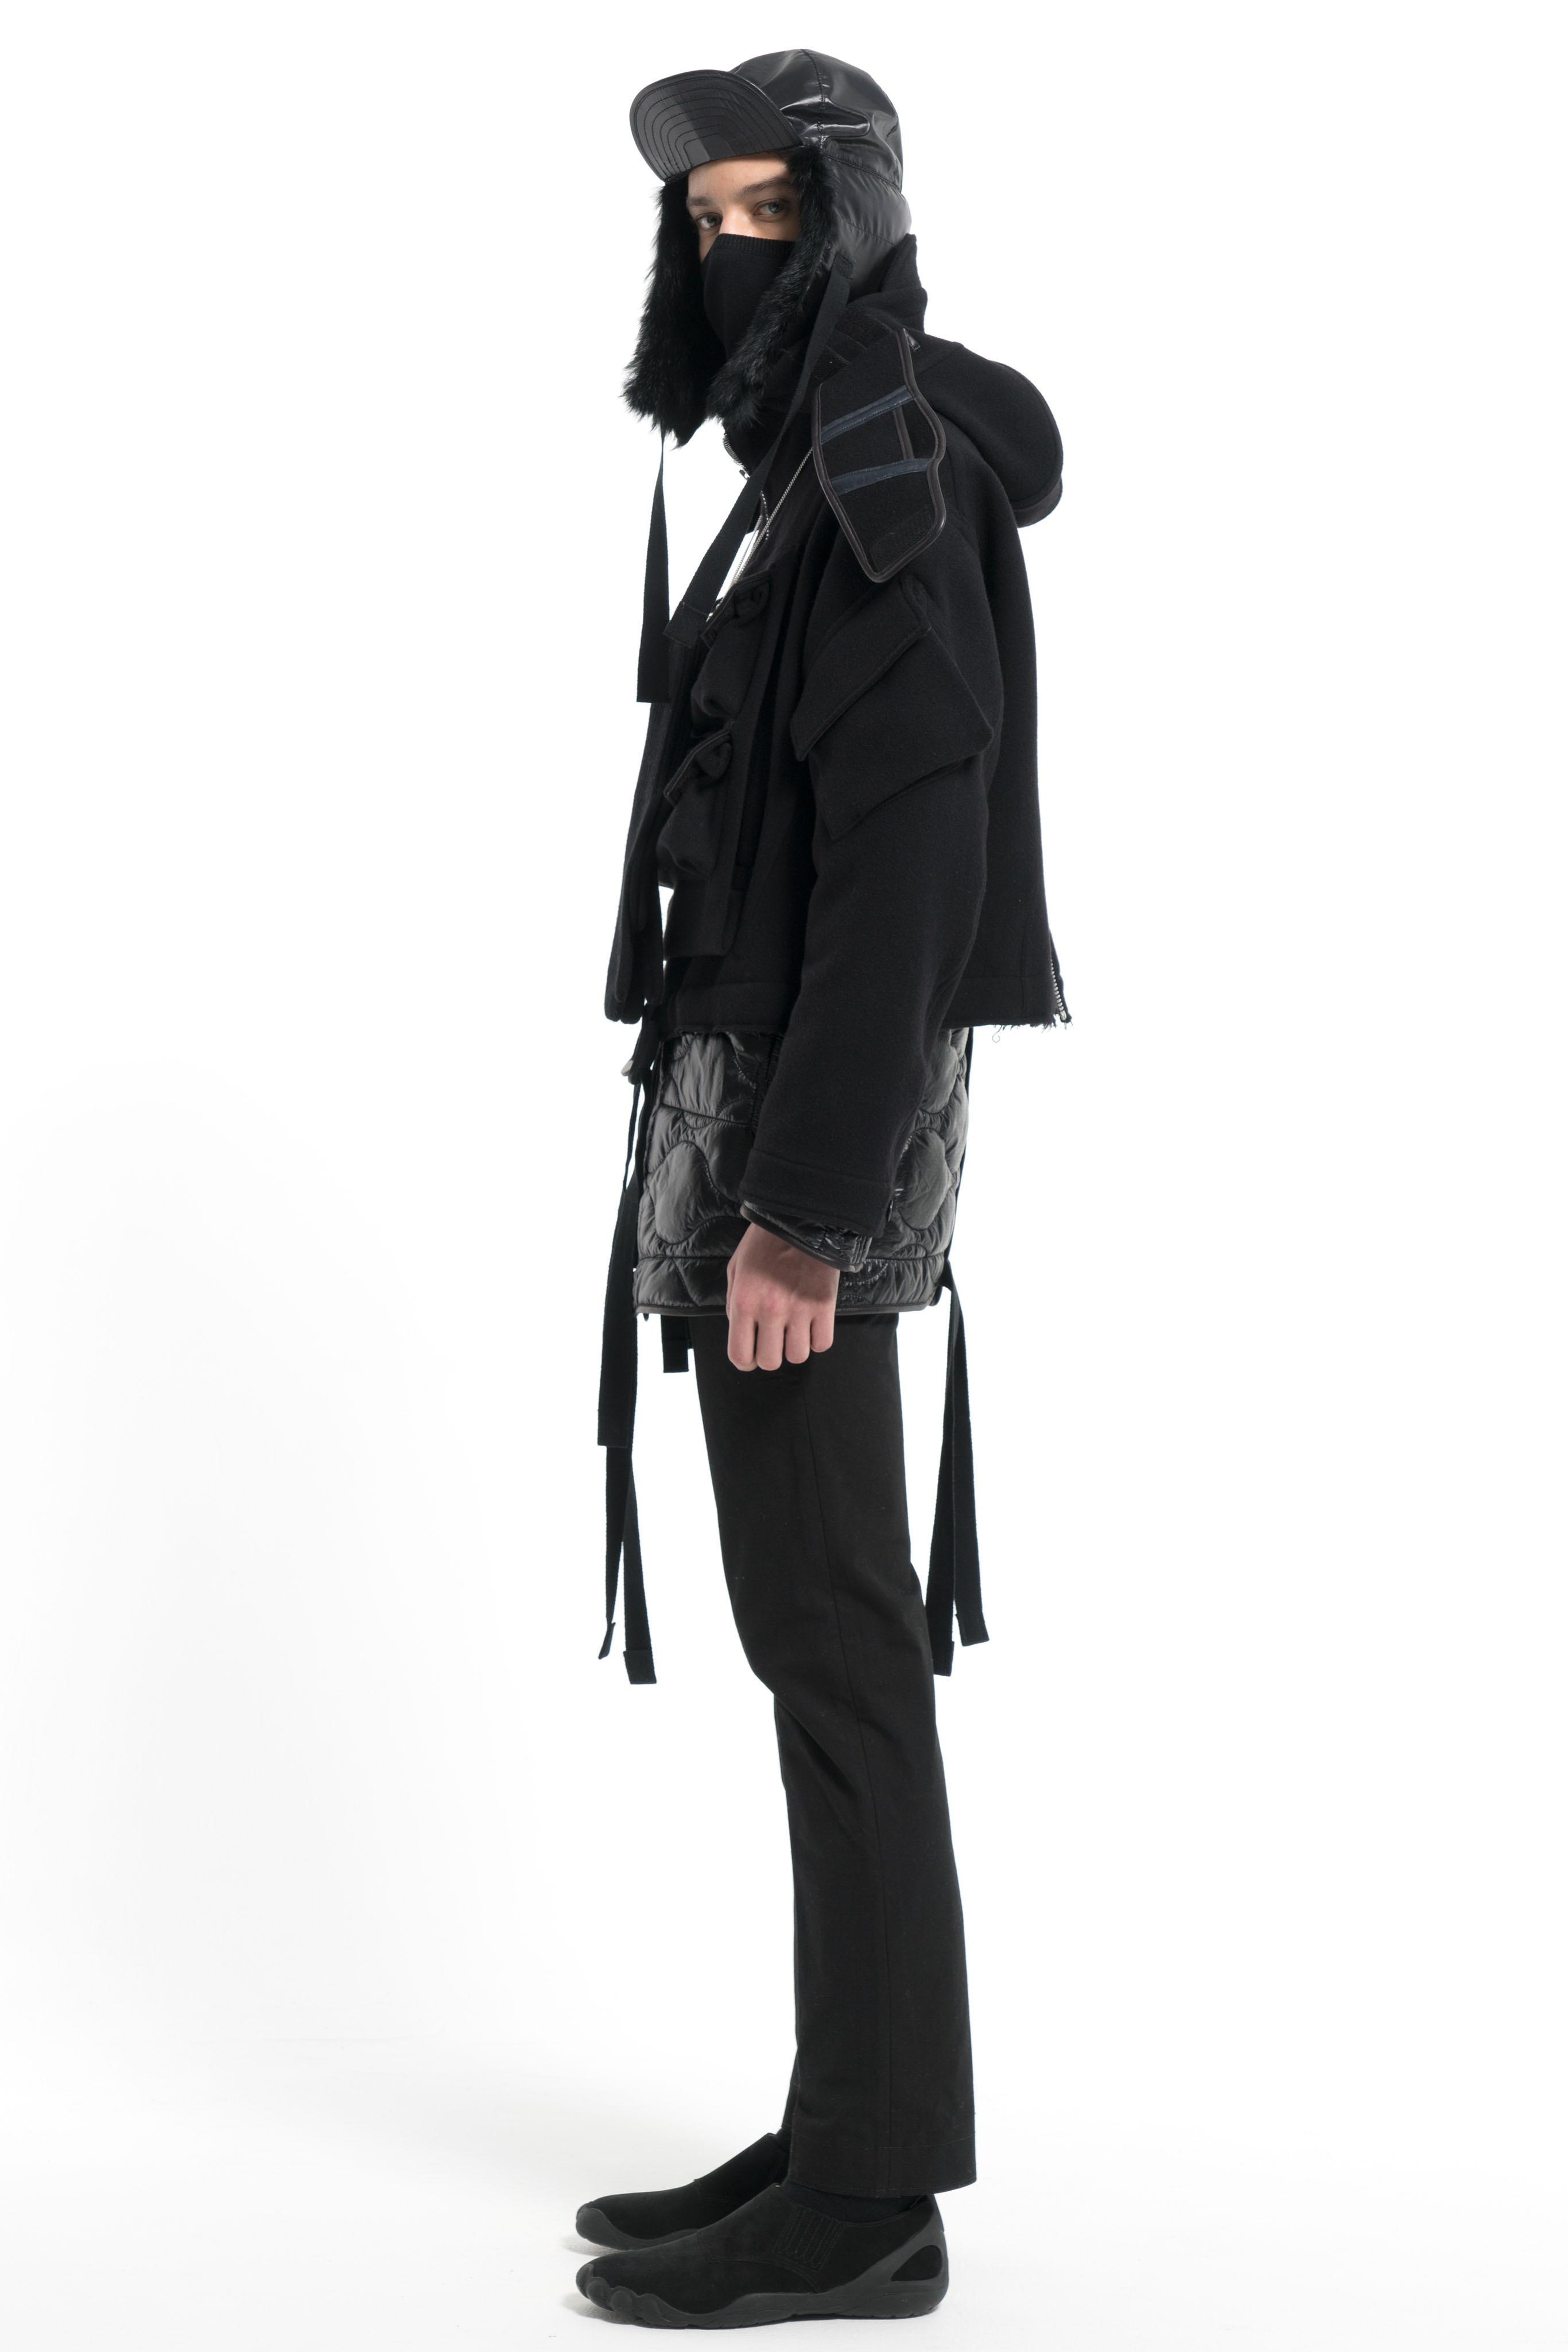 TAKAHIROMIYASHITA The Soloist F/W17 Men's - Paris - fashion - TAKAHIROMIYASHITA The Soloist, StyleZeitgeist, PFW, Paris, MENSWEAR, lookbook, FW17, Fashion, Fall Winter, 2017